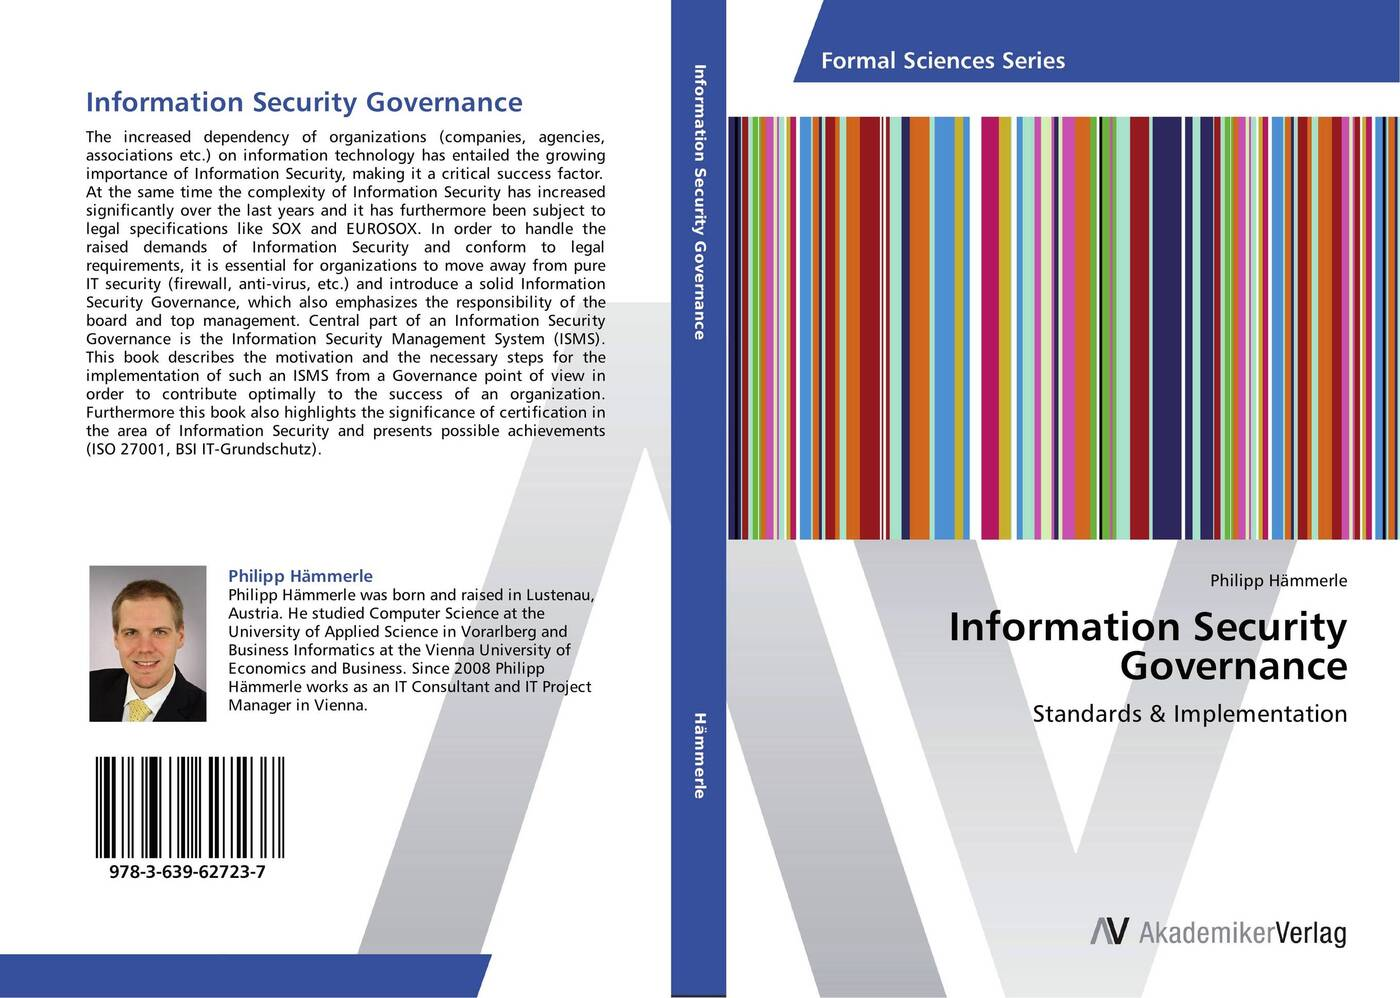 Philipp Hämmerle Information Security Governance